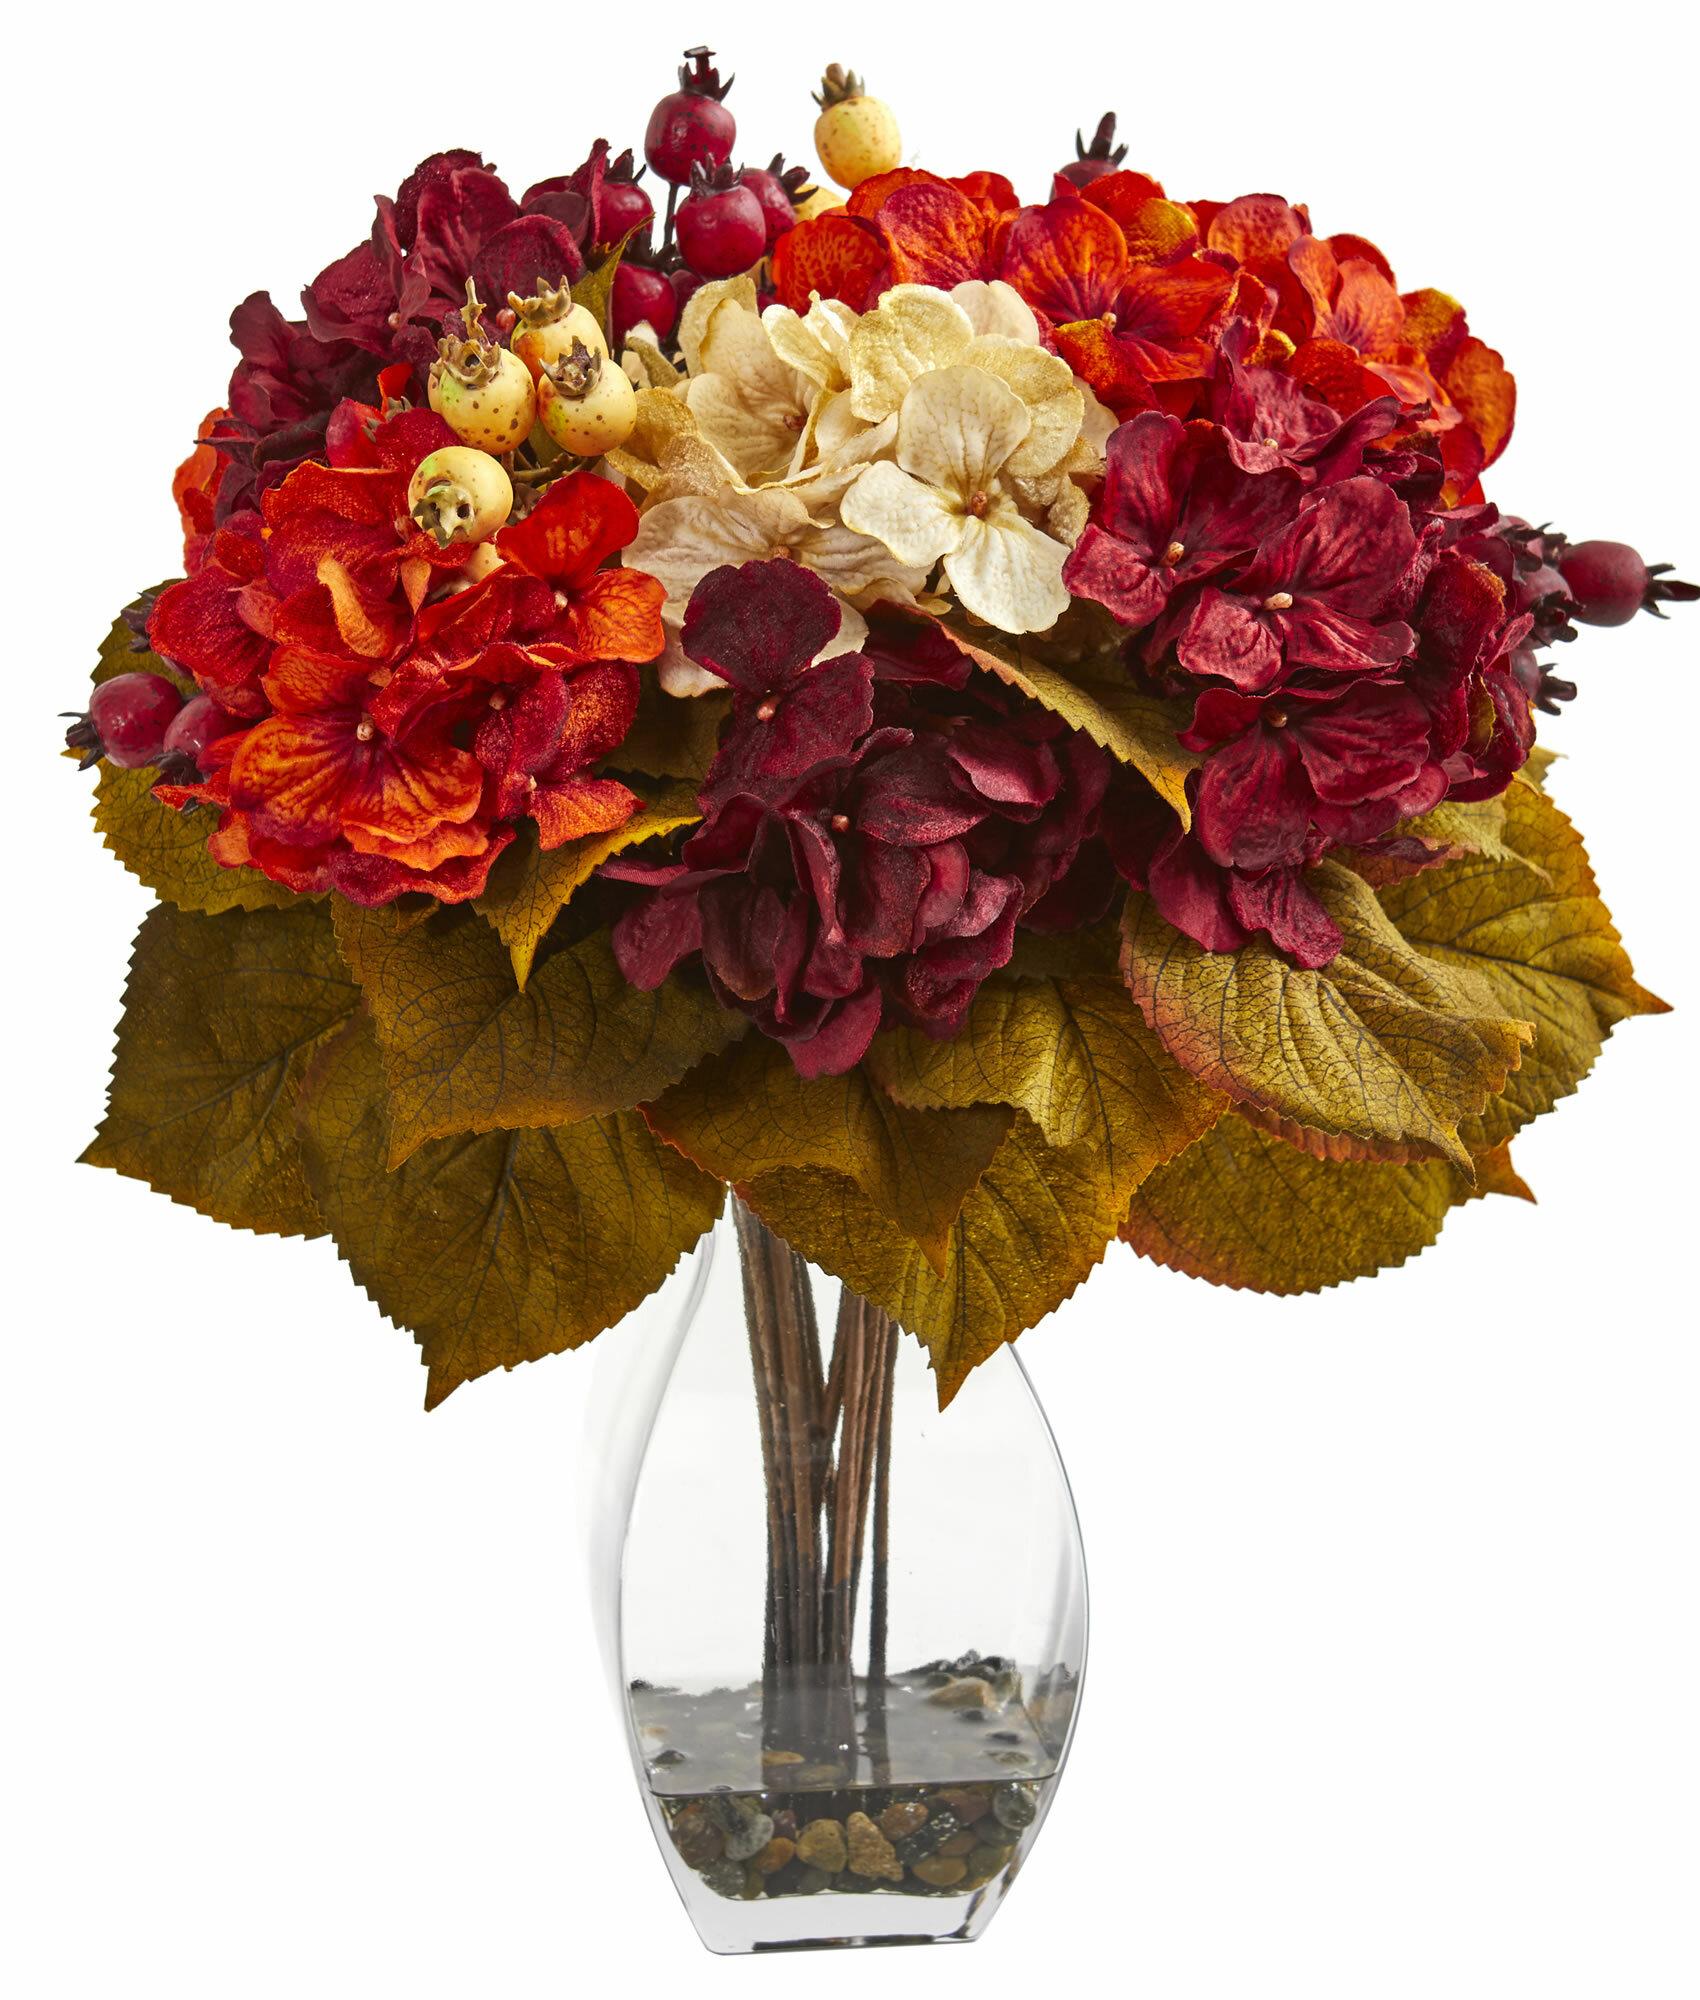 Charlton Home Artificial Autumn Hydrangea Floral Arrangement In Vase Wayfair